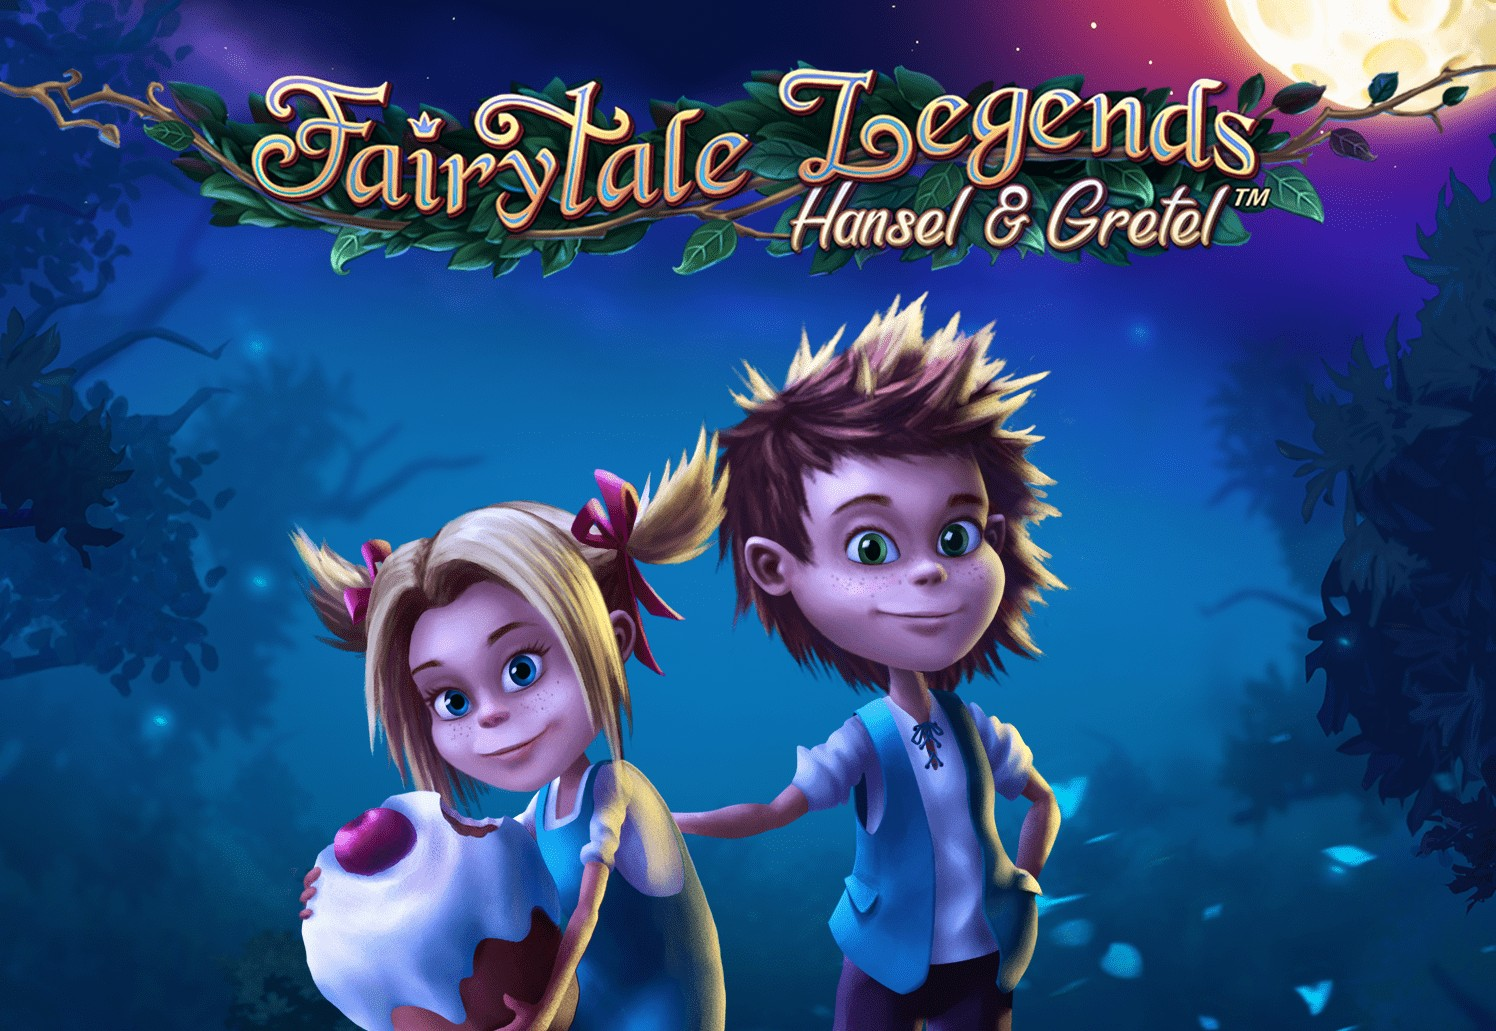 Fairytale Legends Hansel and Gretel netent casino logo